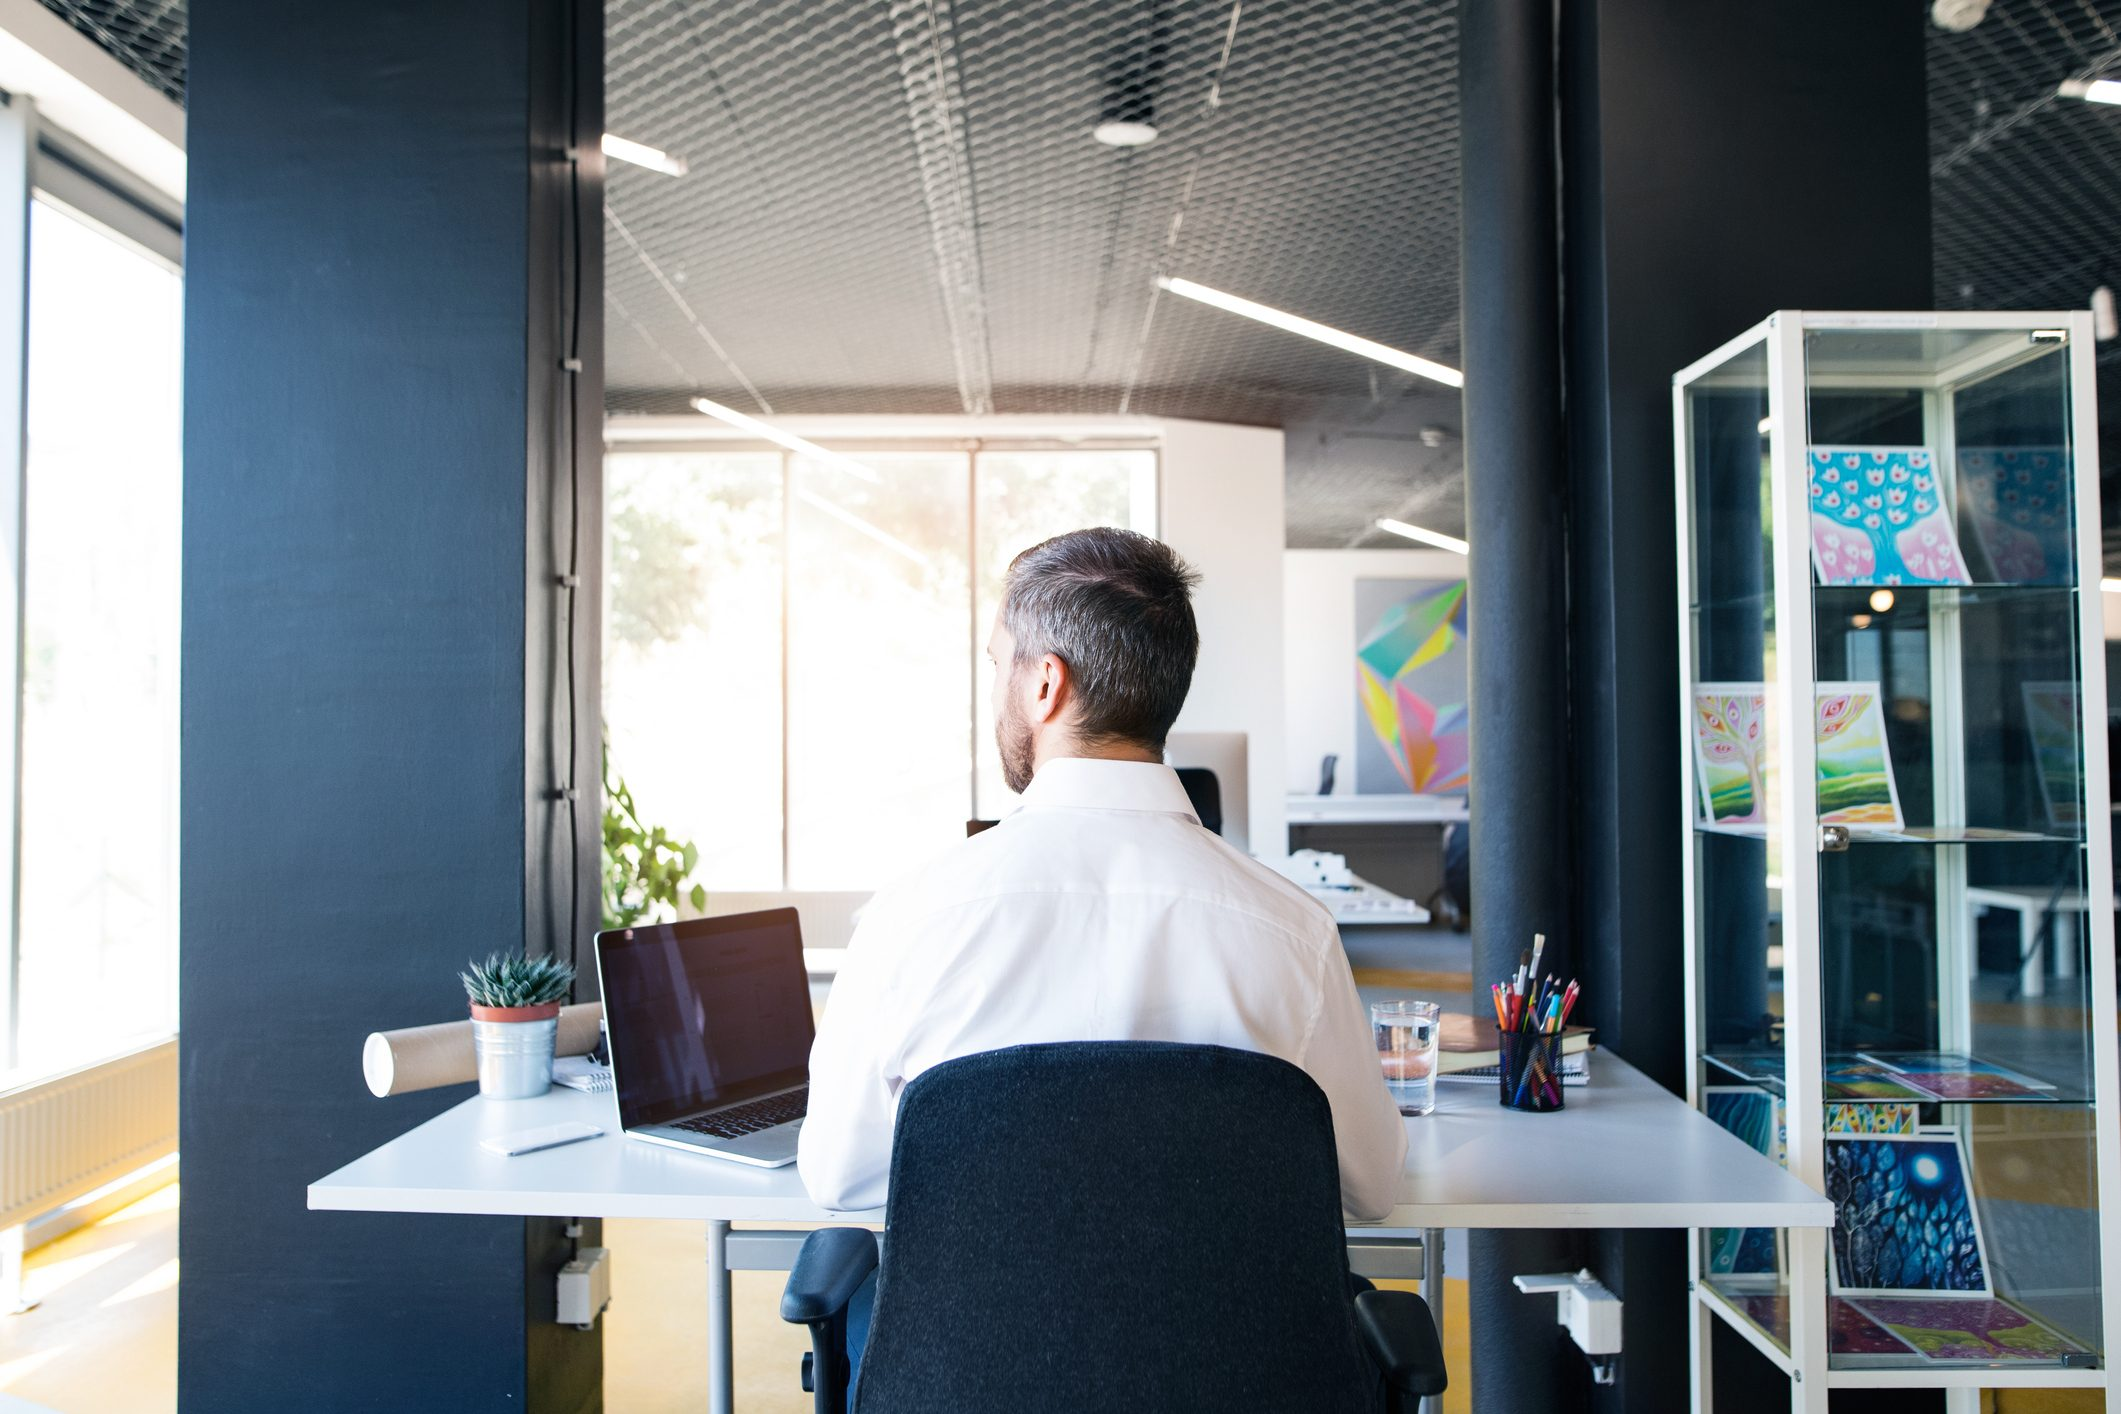 businessman sitting at desk working